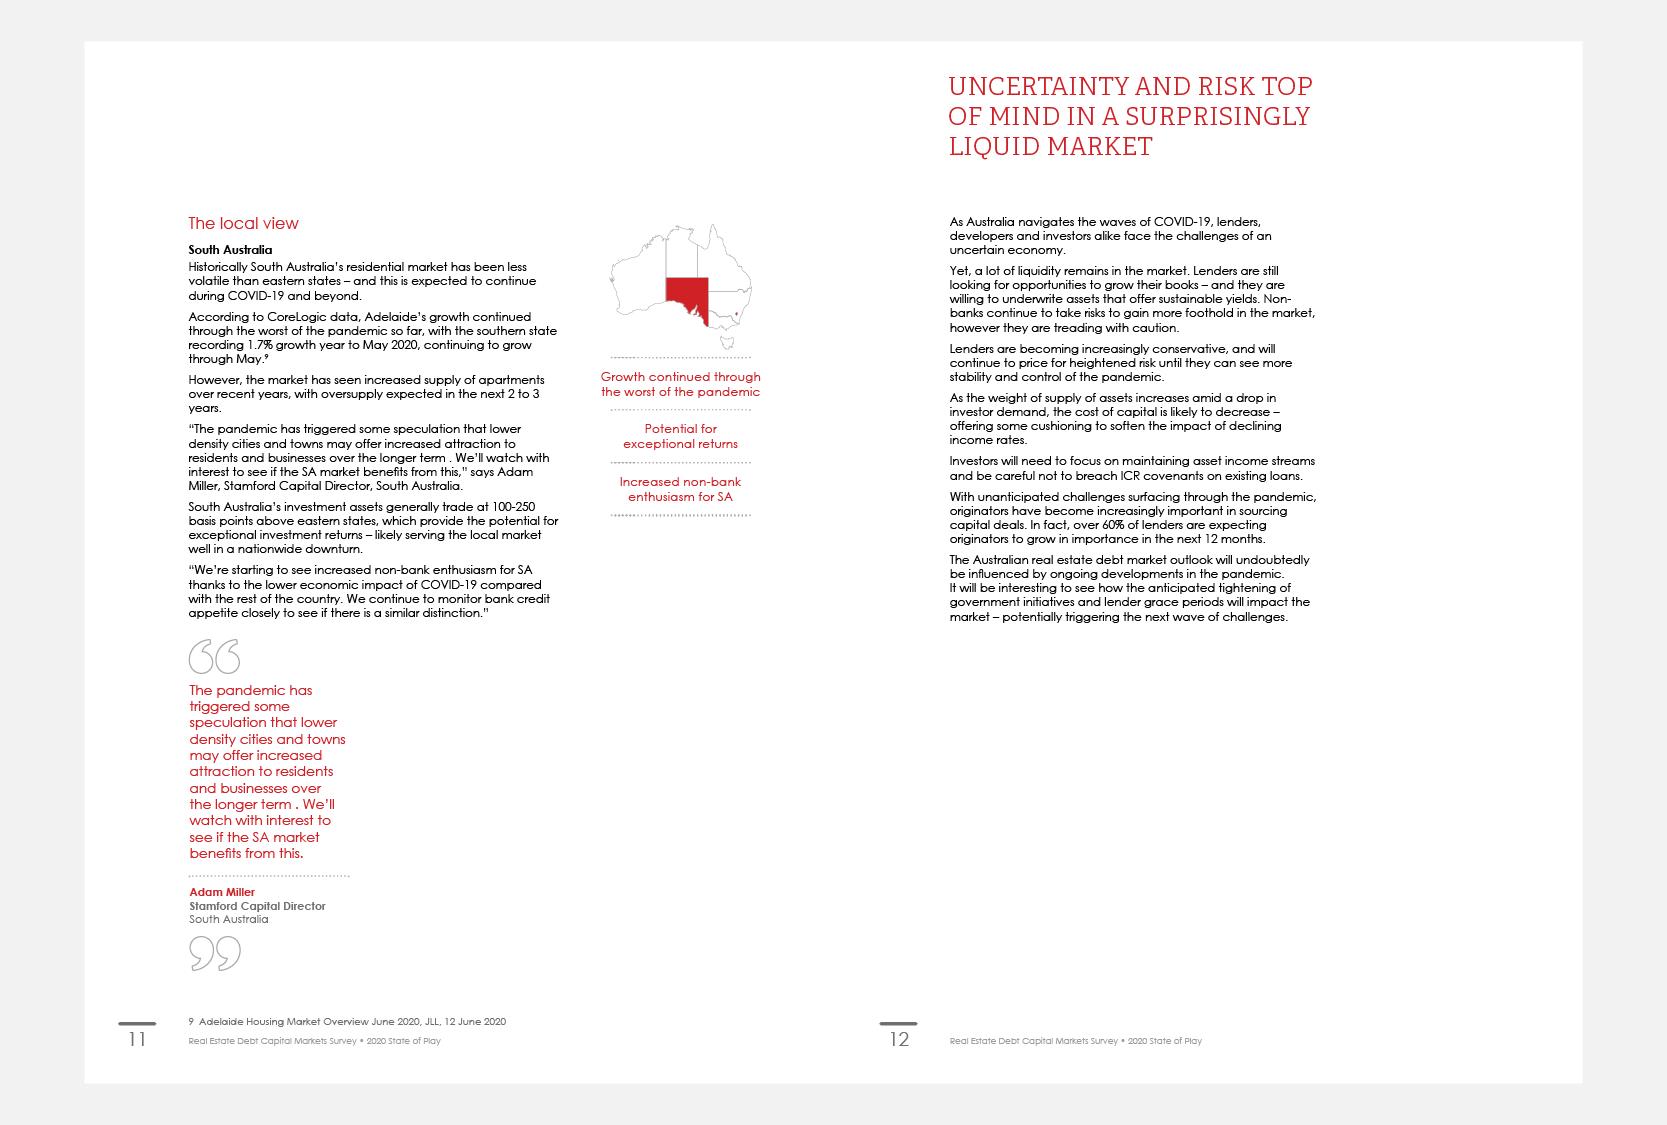 Stamford Capital - Writers case study